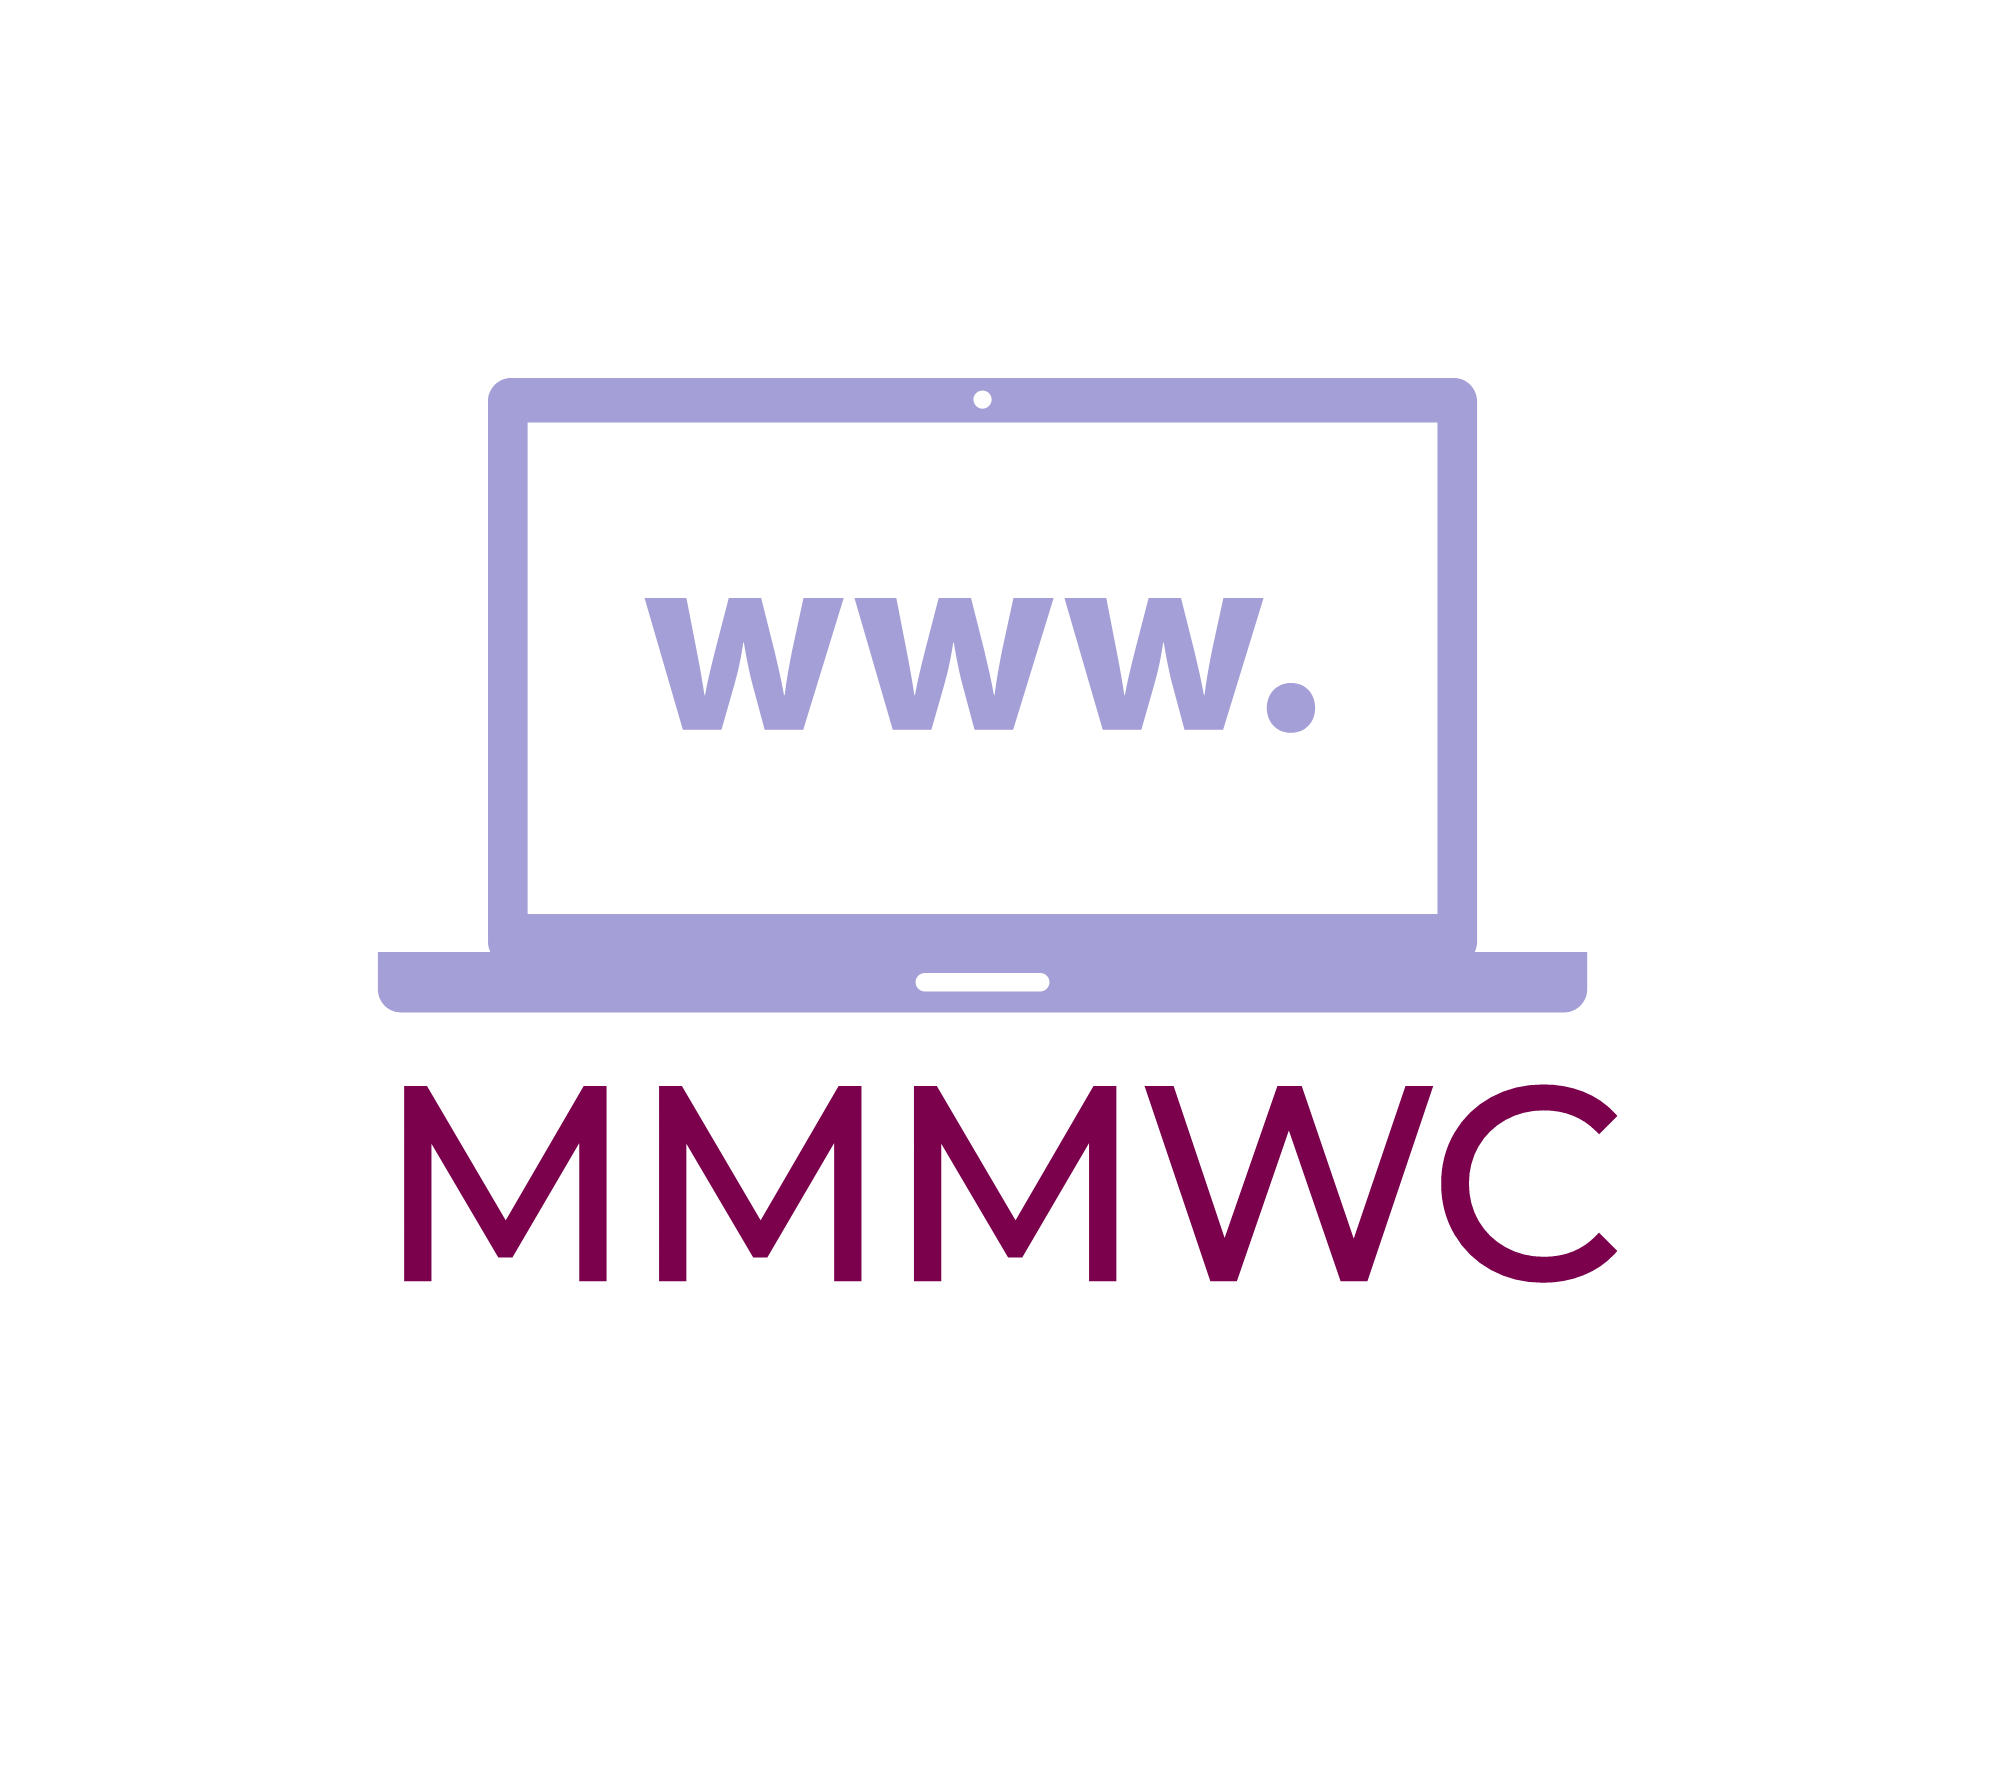 MMMWC